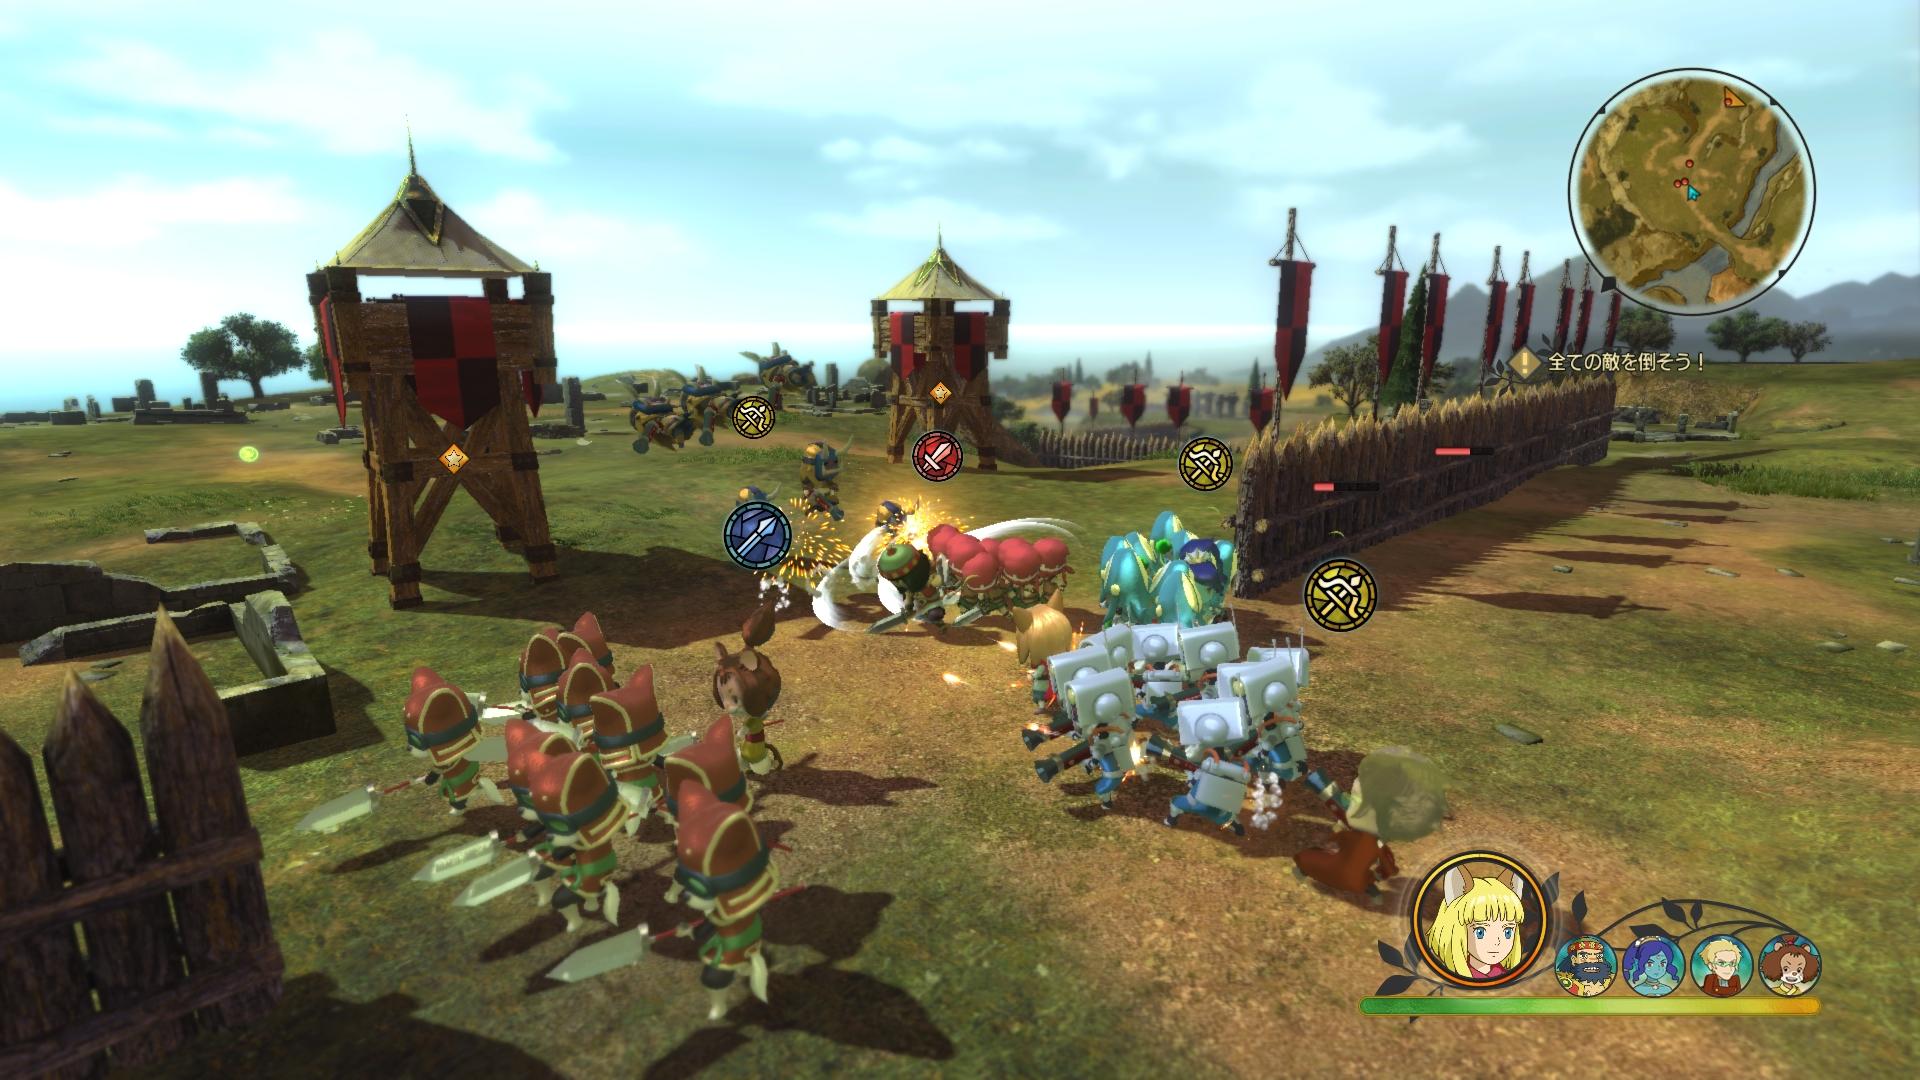 Ni no Kuni II: Revenant Kingdom v traileru a na screenshotech pro letošní Gamescom 148580